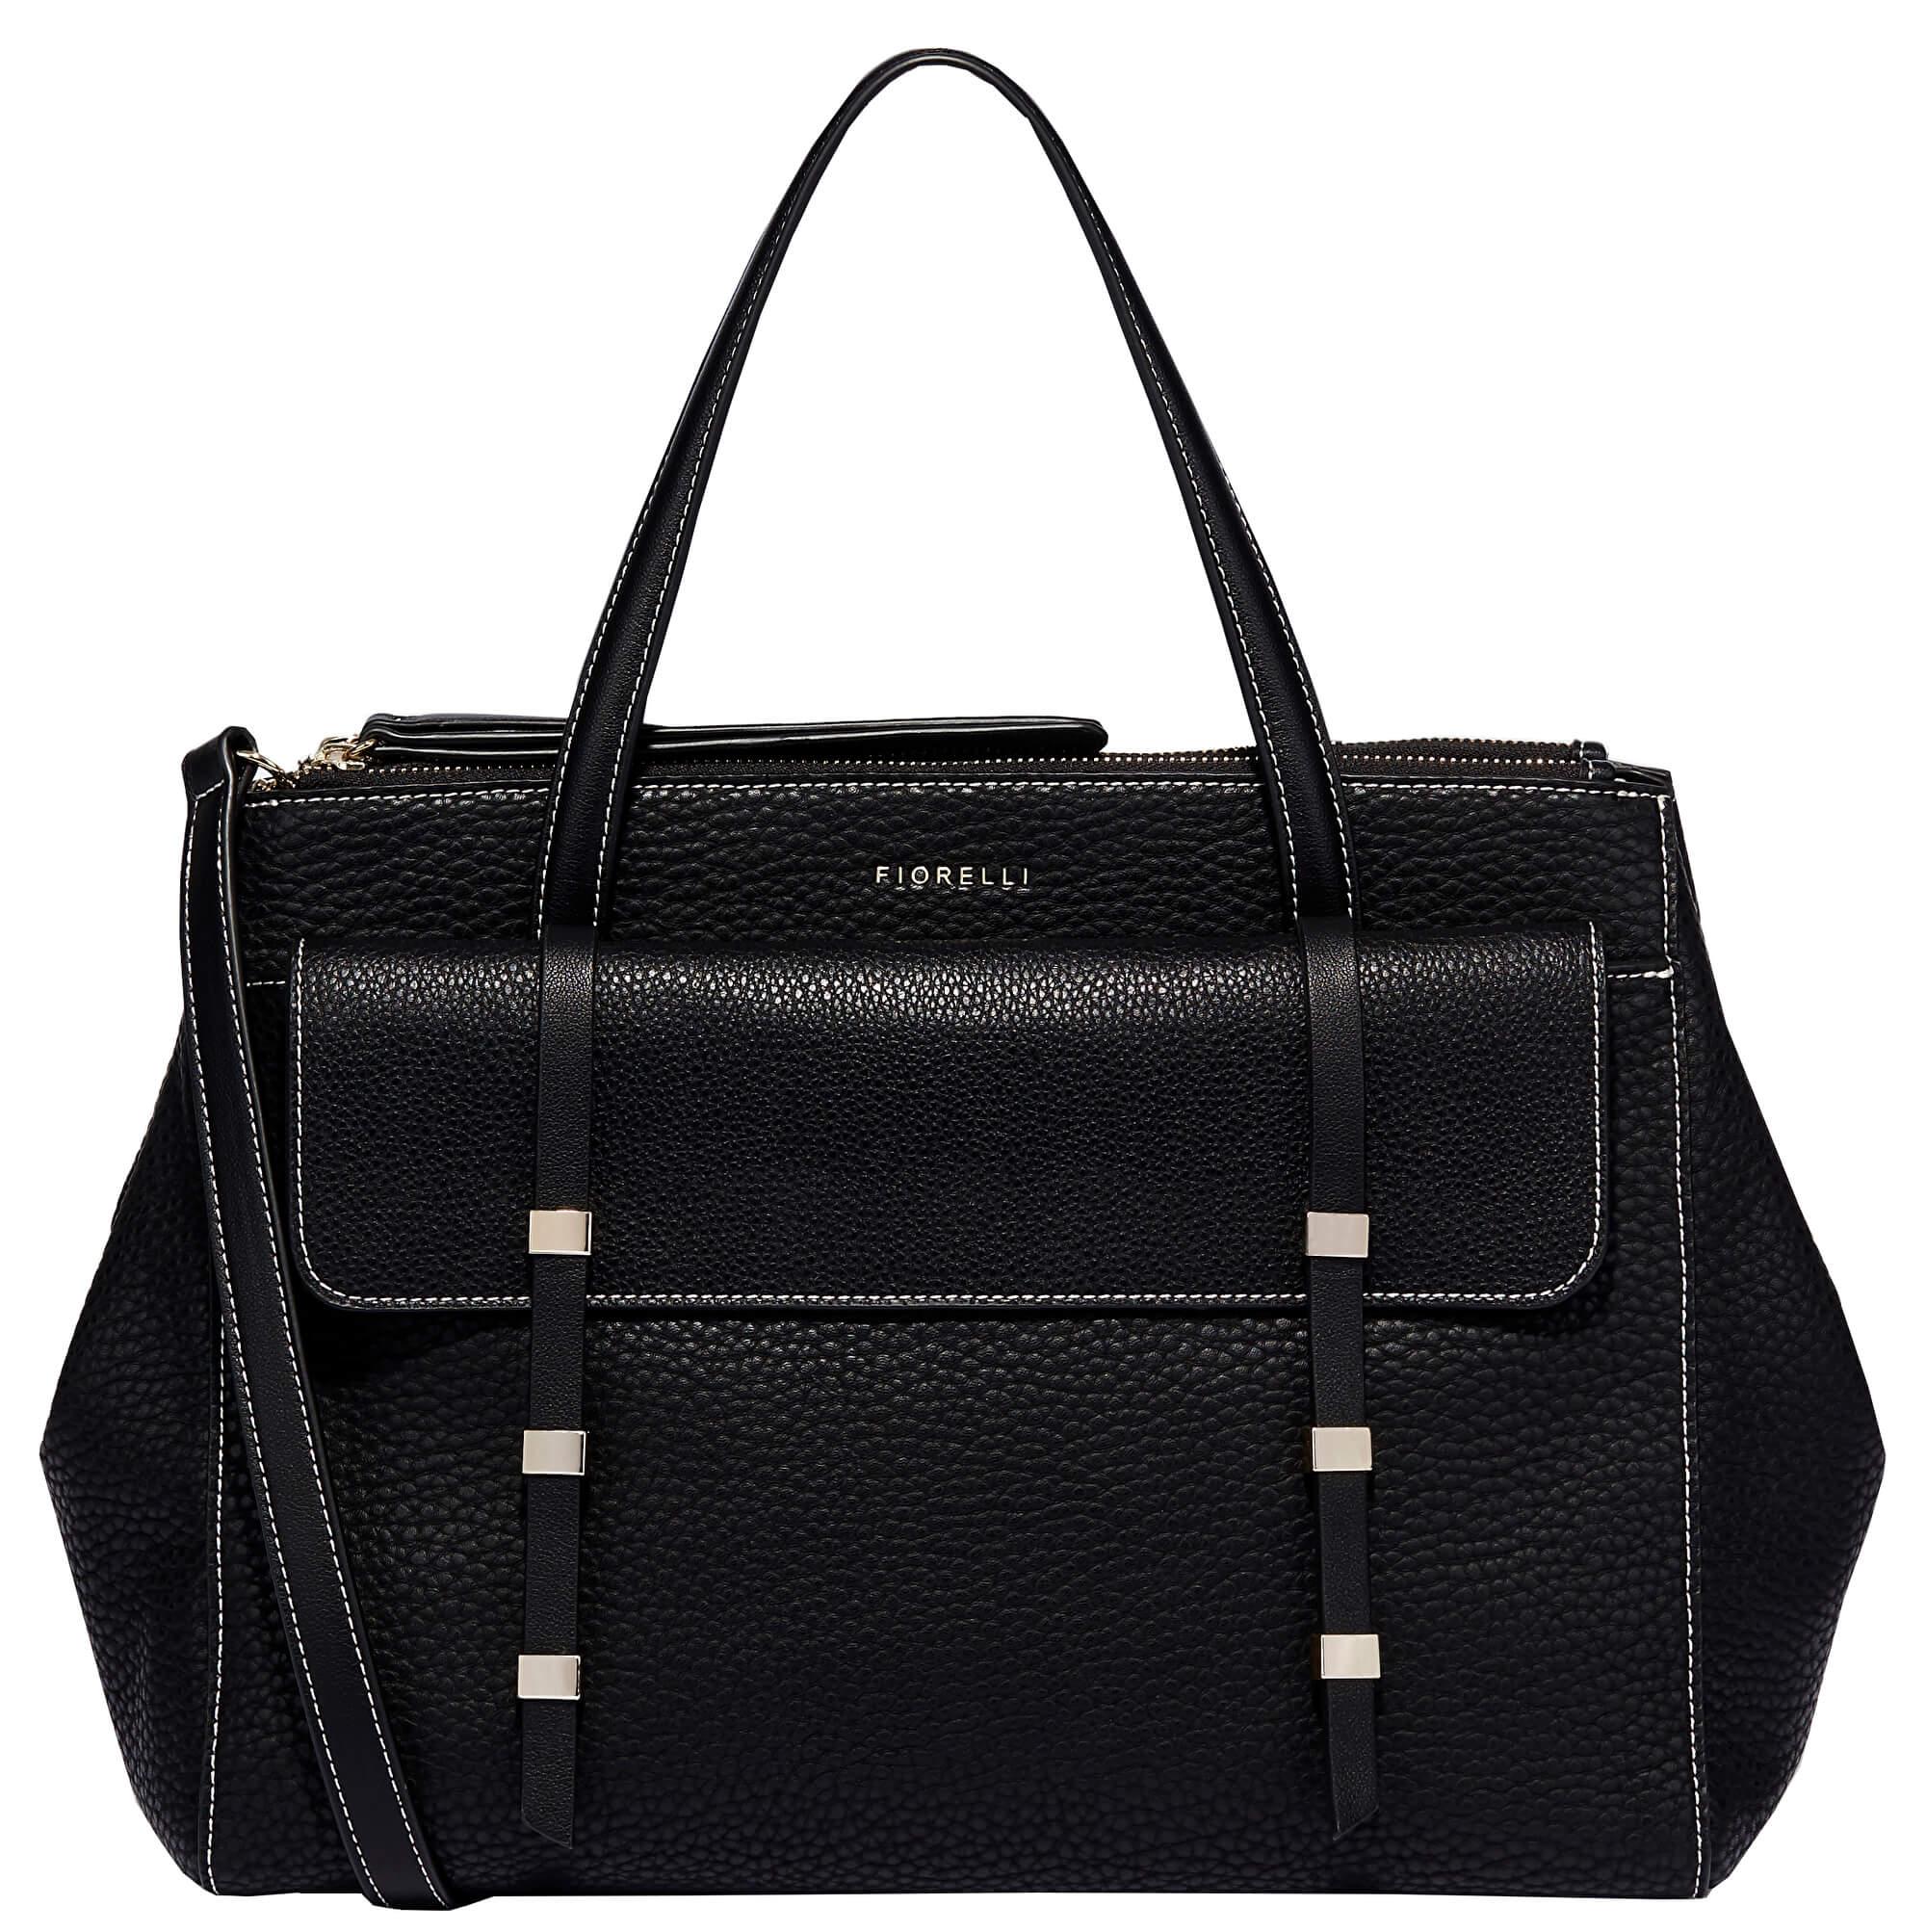 Fiorelli Elegantní kabelka Soho FWH0193 Black Doprava ZDARMA ... ea3023fea6e